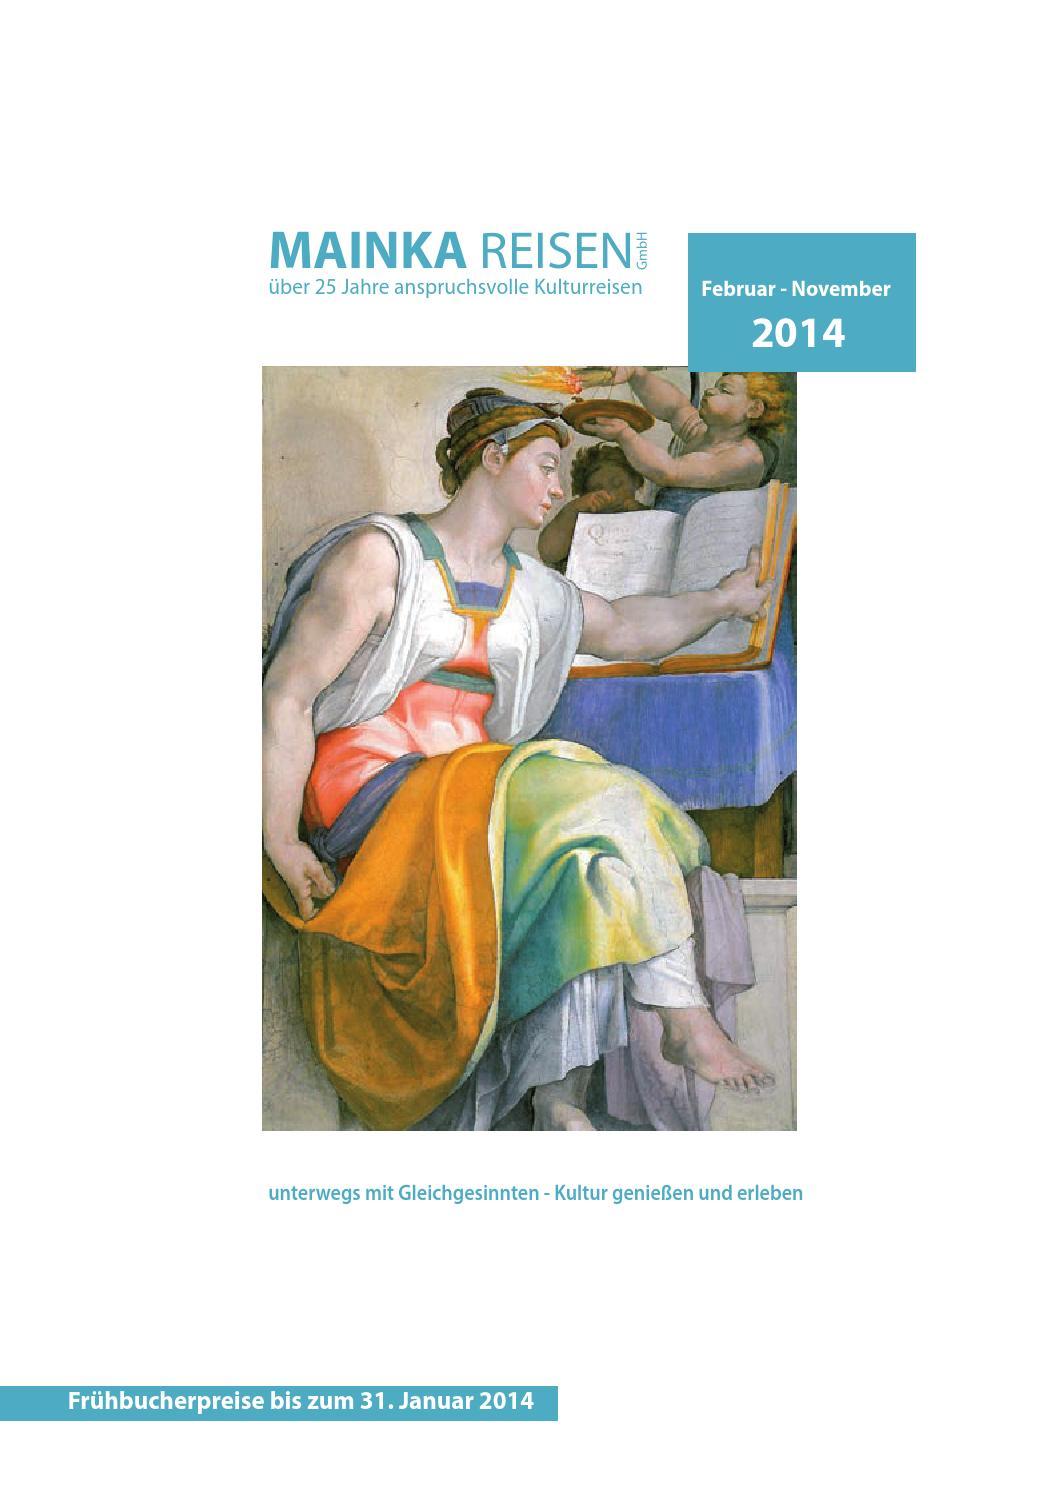 Mainka Katalog 2014 By Gerryland AG   Issuu